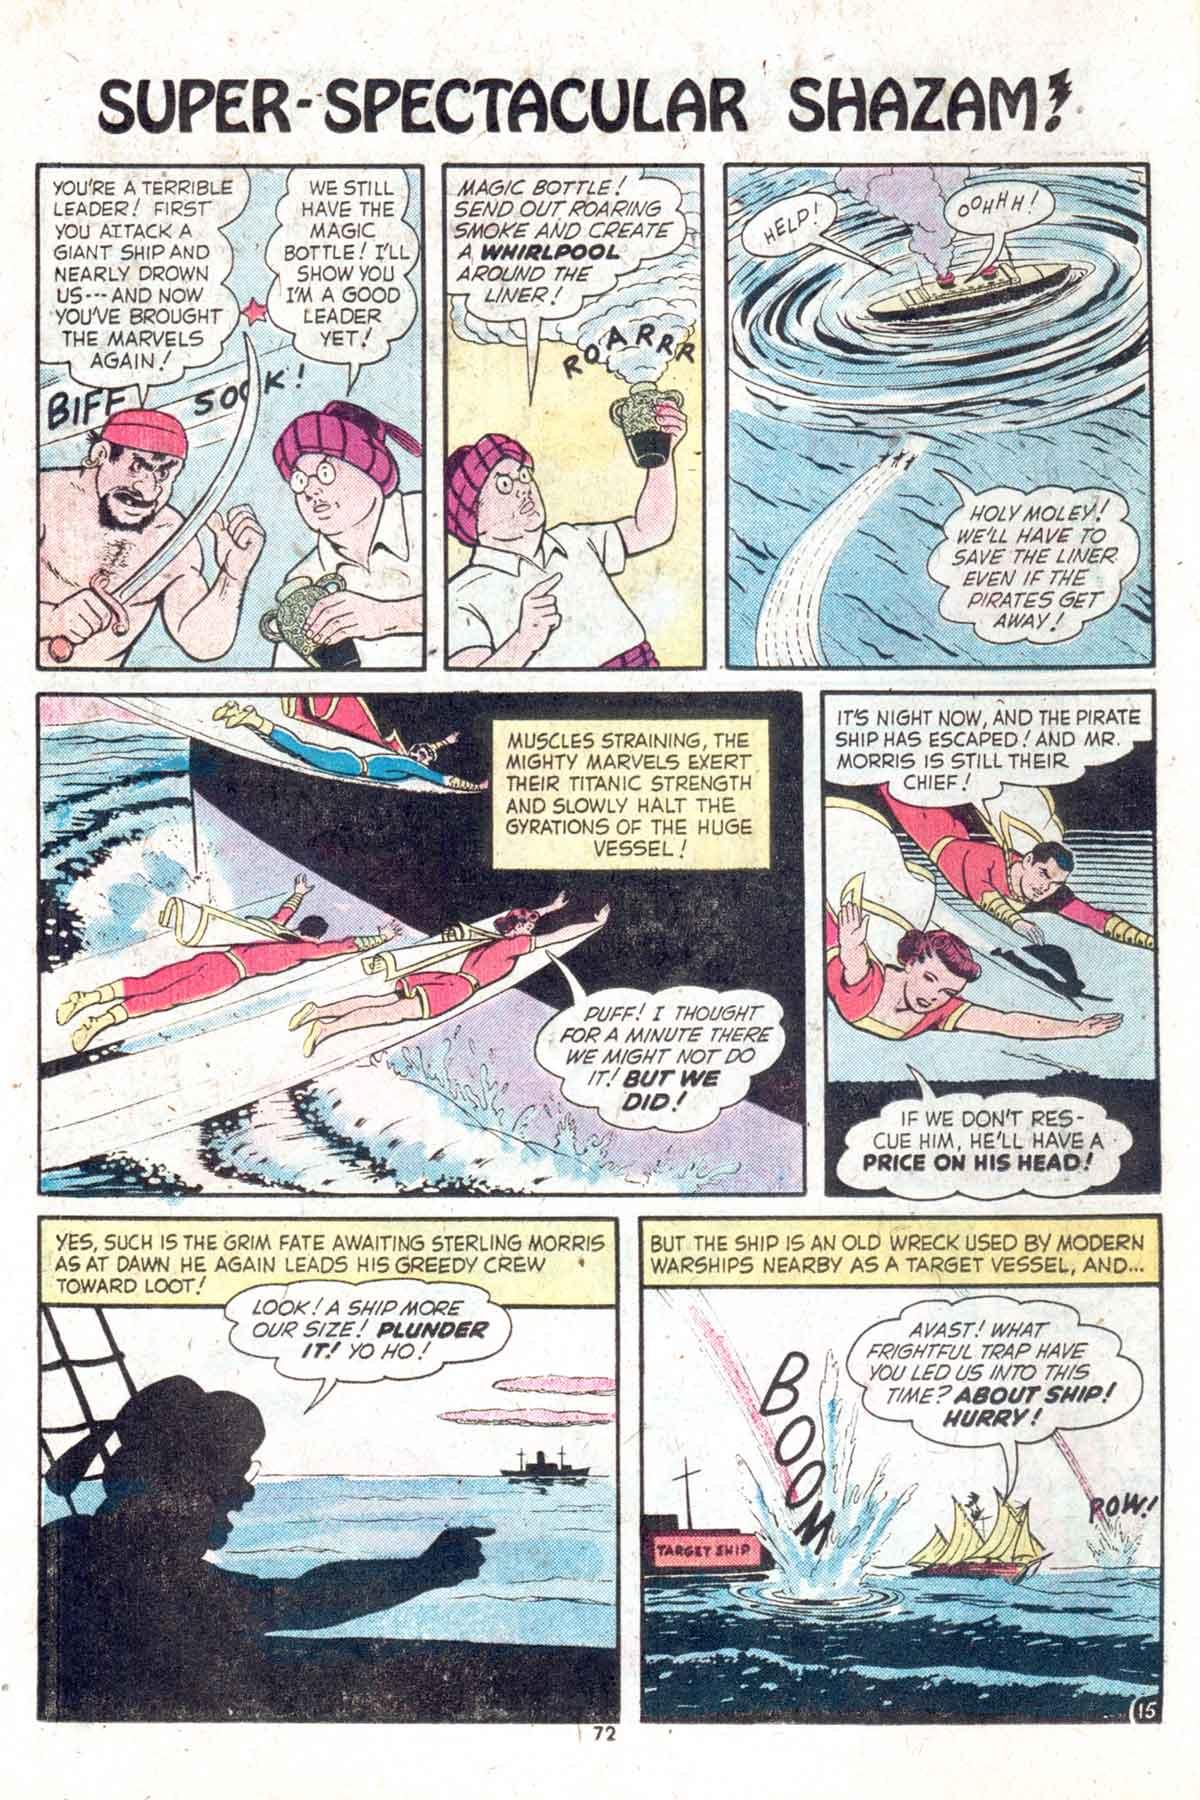 Read online Shazam! (1973) comic -  Issue #13 - 73